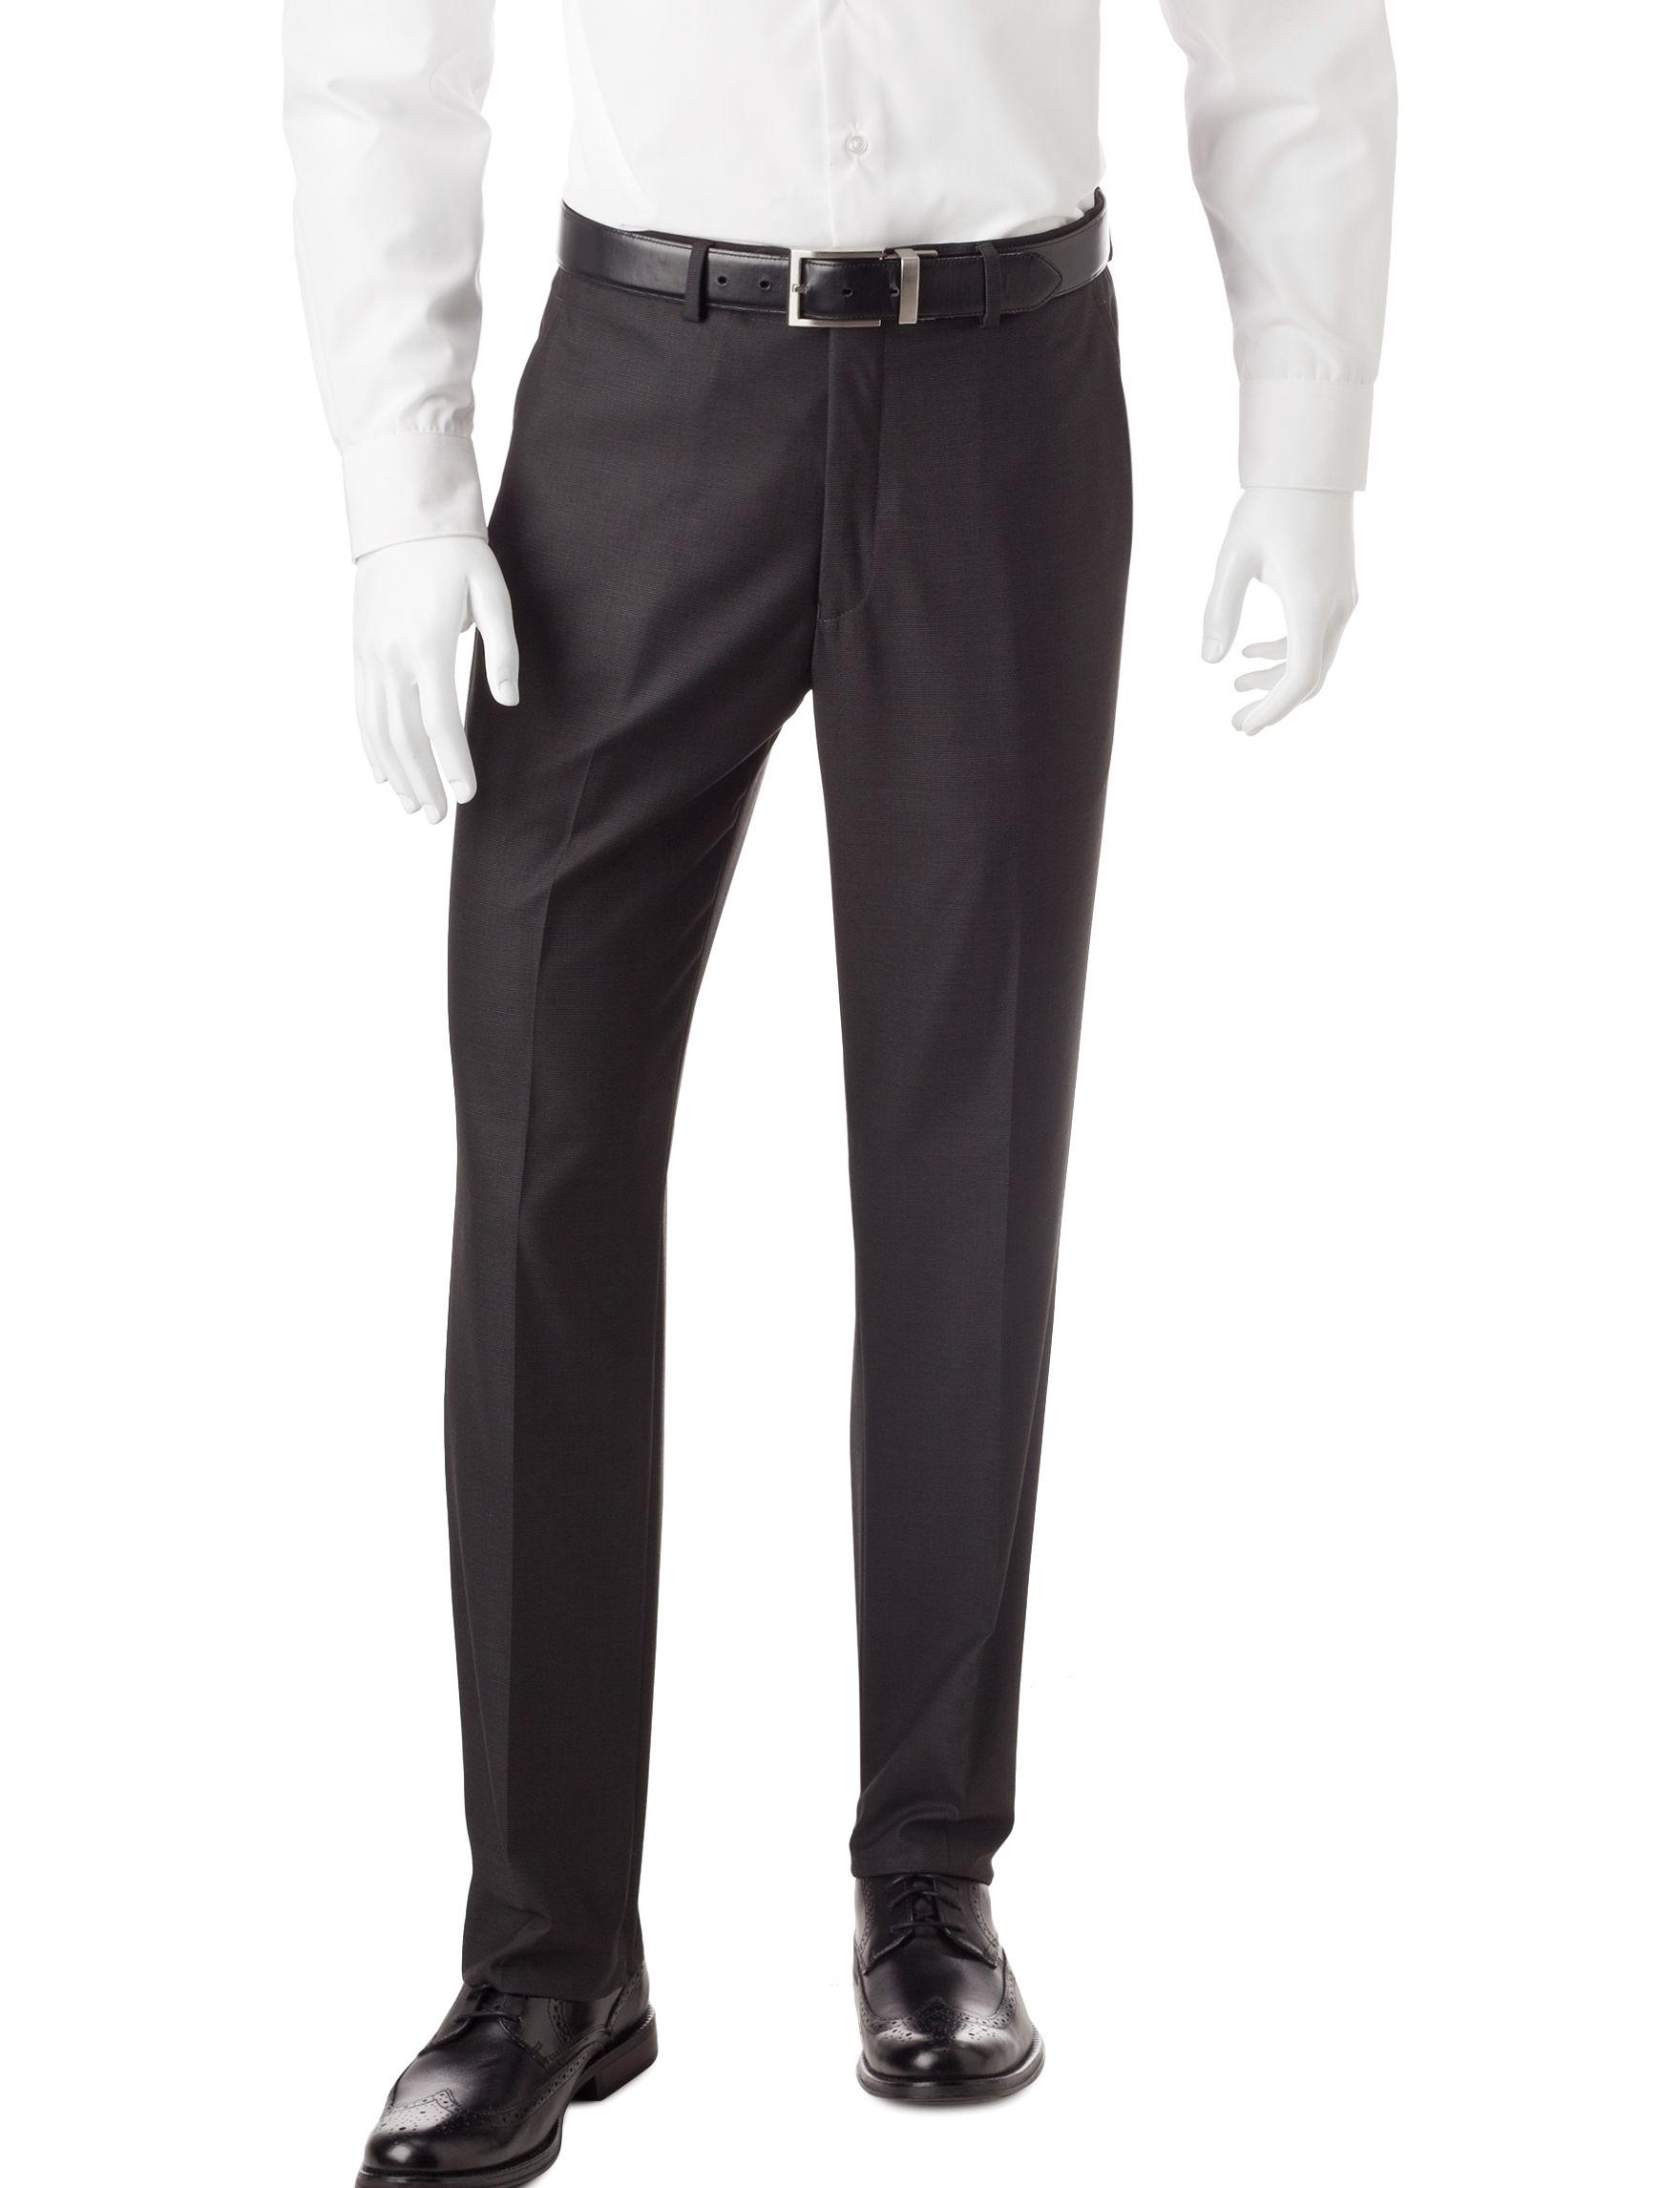 Greg Norman Luxe Dress Pants